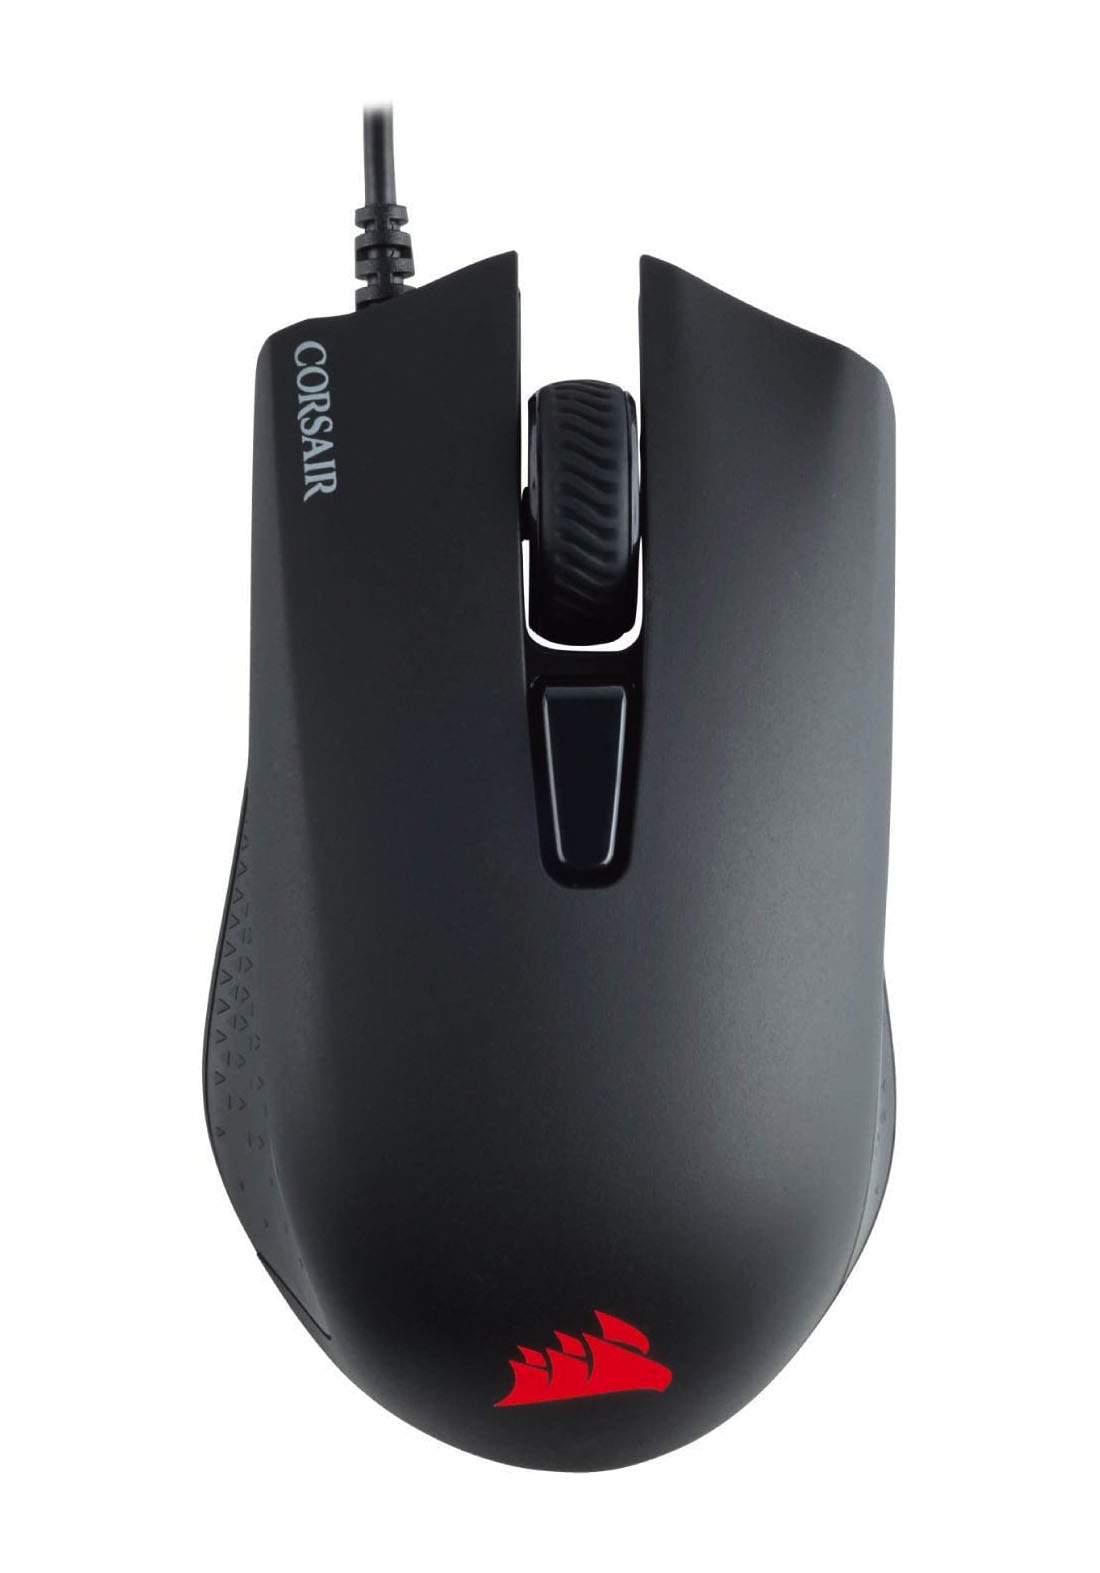 Corsair Harpoon Pro Rgb Gaming Lightweight Design Mouse ماوس